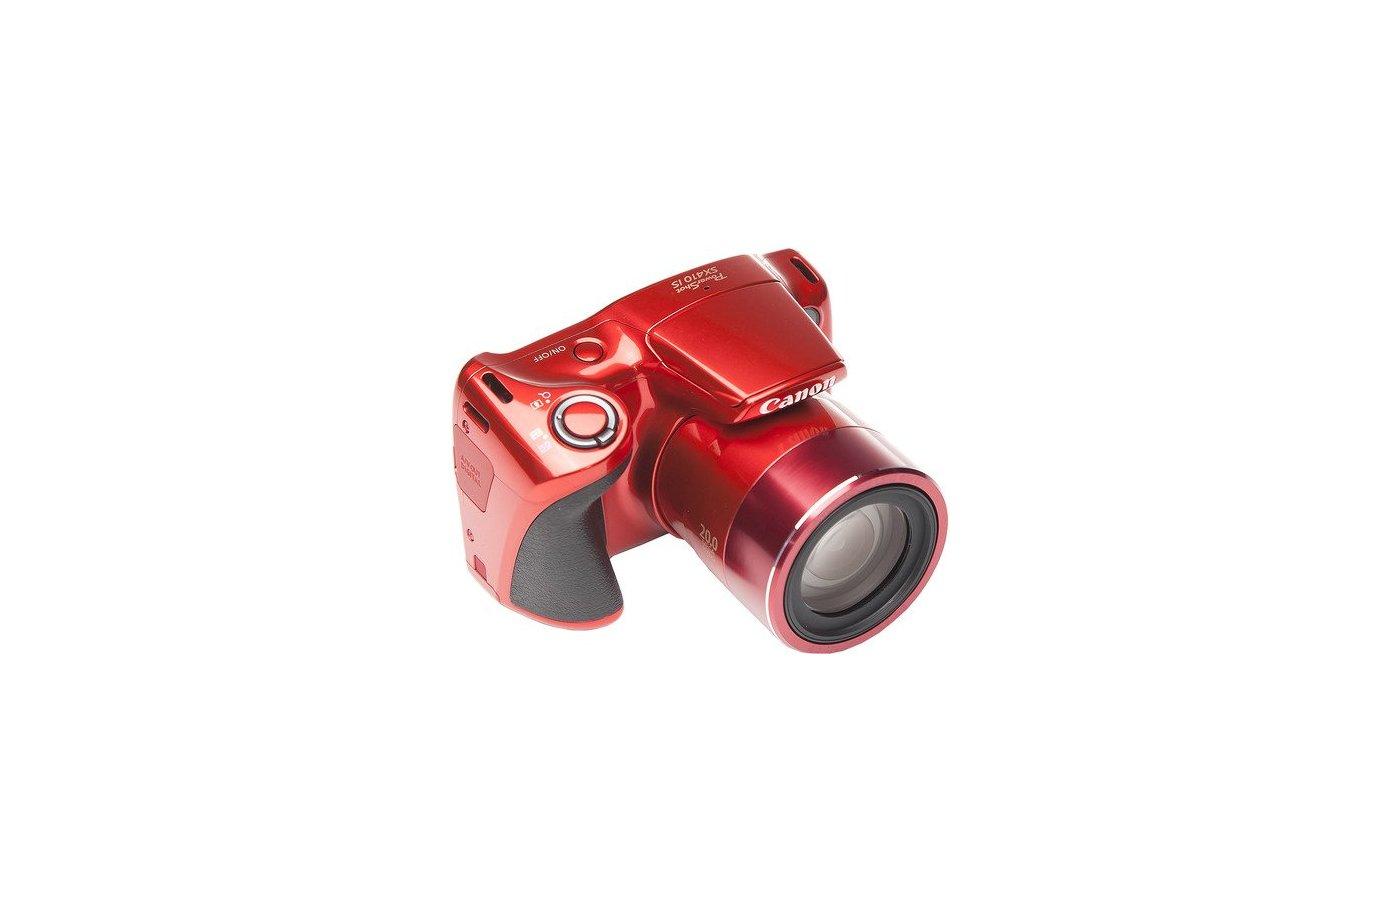 Фотоаппарат компактный CANON PowerShot SX410 IS red